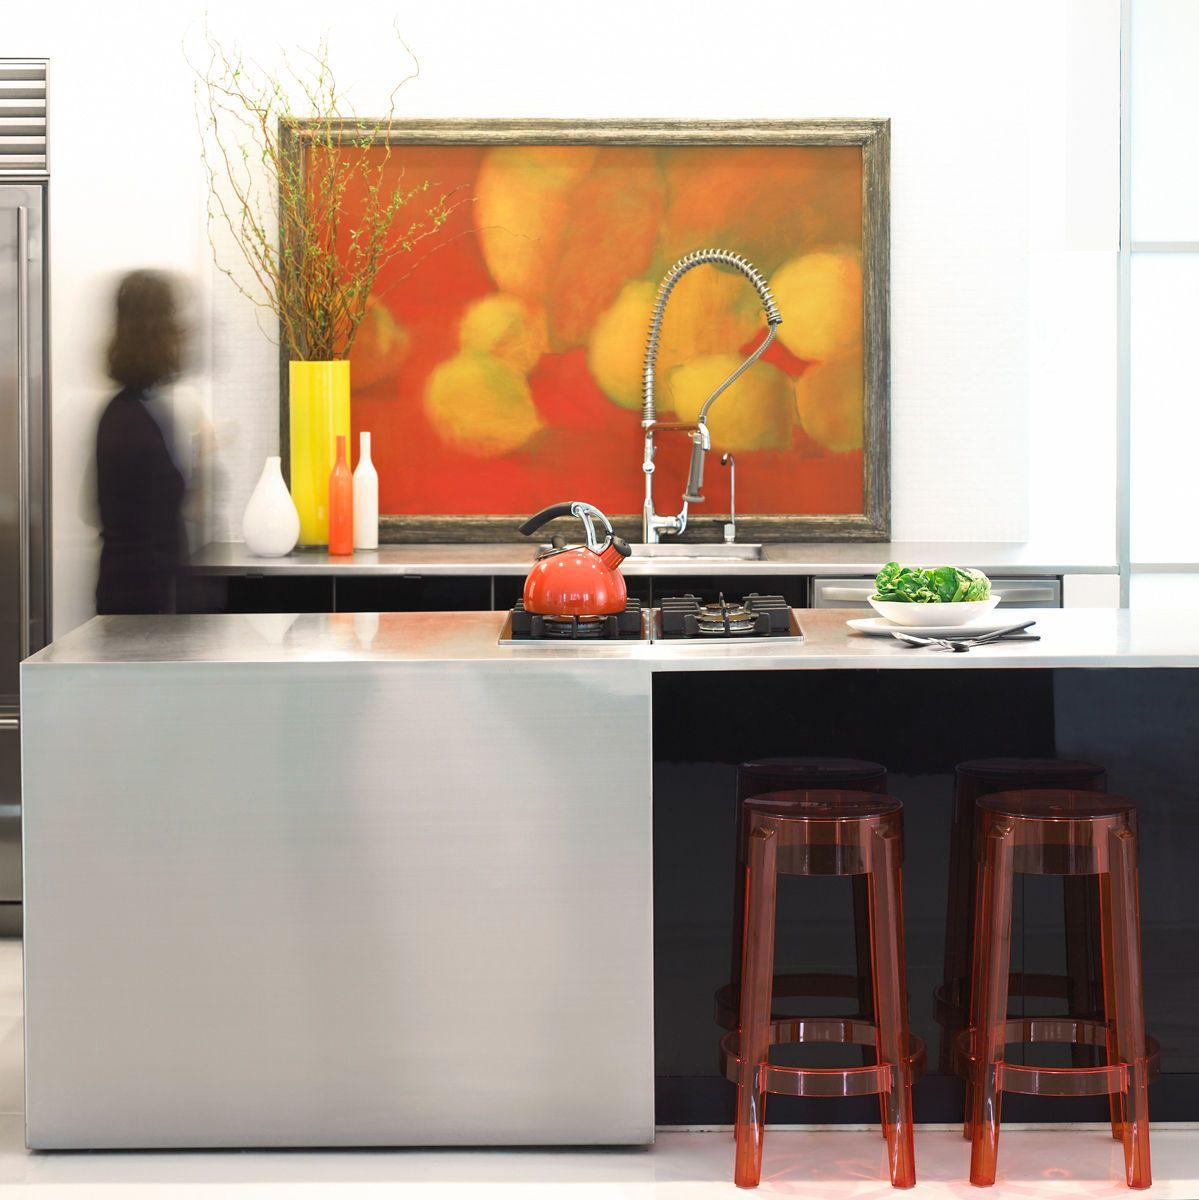 1modern_kitchen_dasha_wright_still_life_photographer